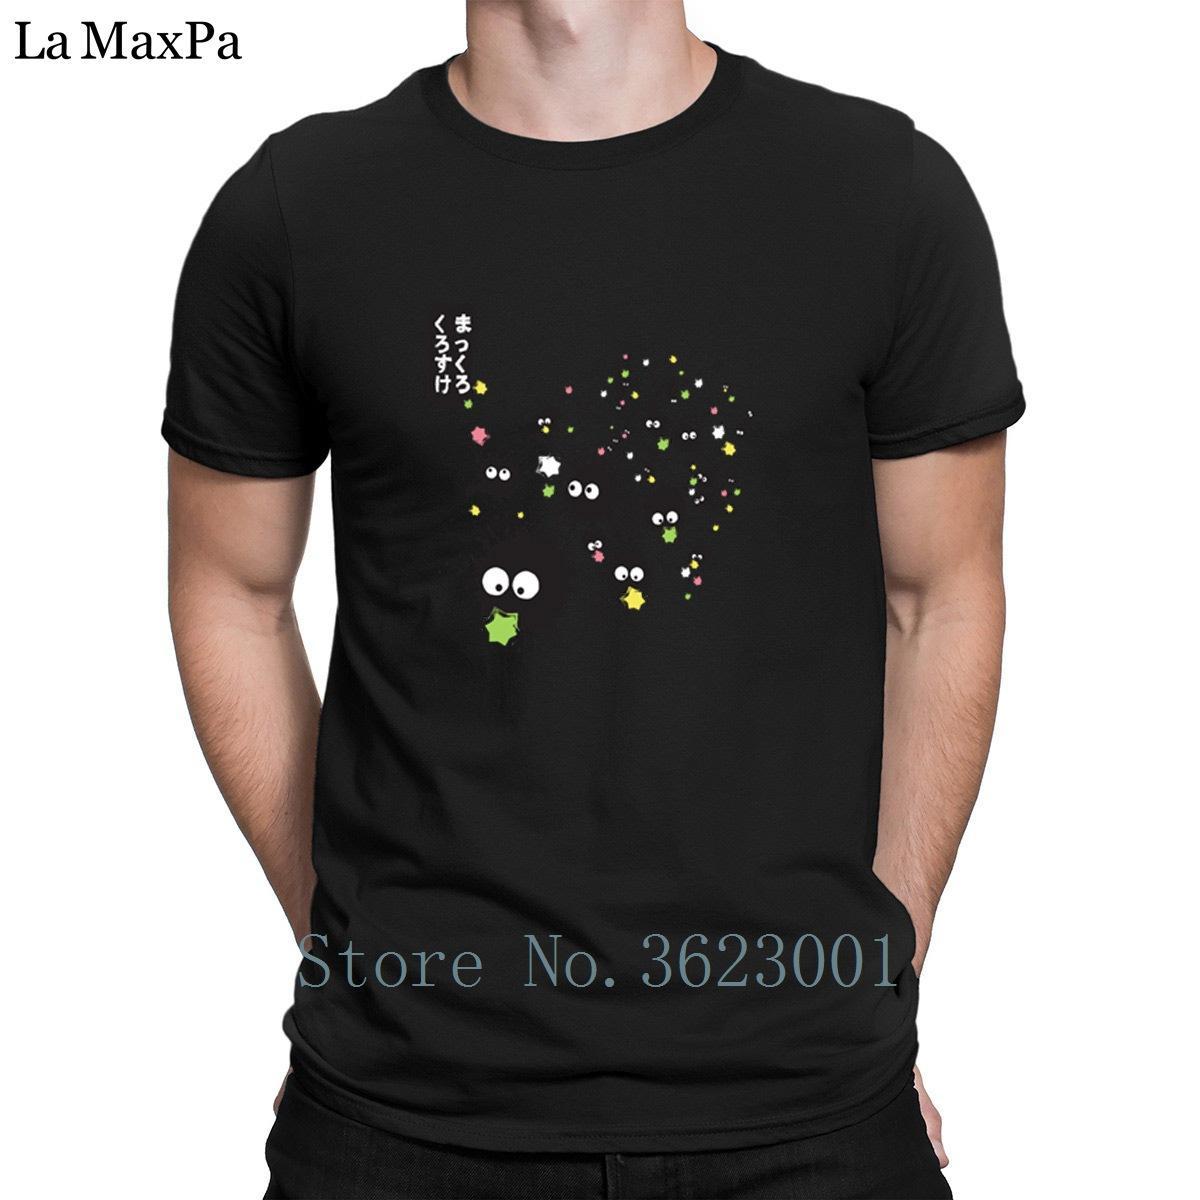 6a56b5950 Create Standard Tee Shirt Makkuro Kurosuke Ink T Shirt Top Quality Crew  Neck Men T Shirt Trendy Tshirt Man 2018 Comfortable Witty Tee Shirts Tee  Shirt Funny ...